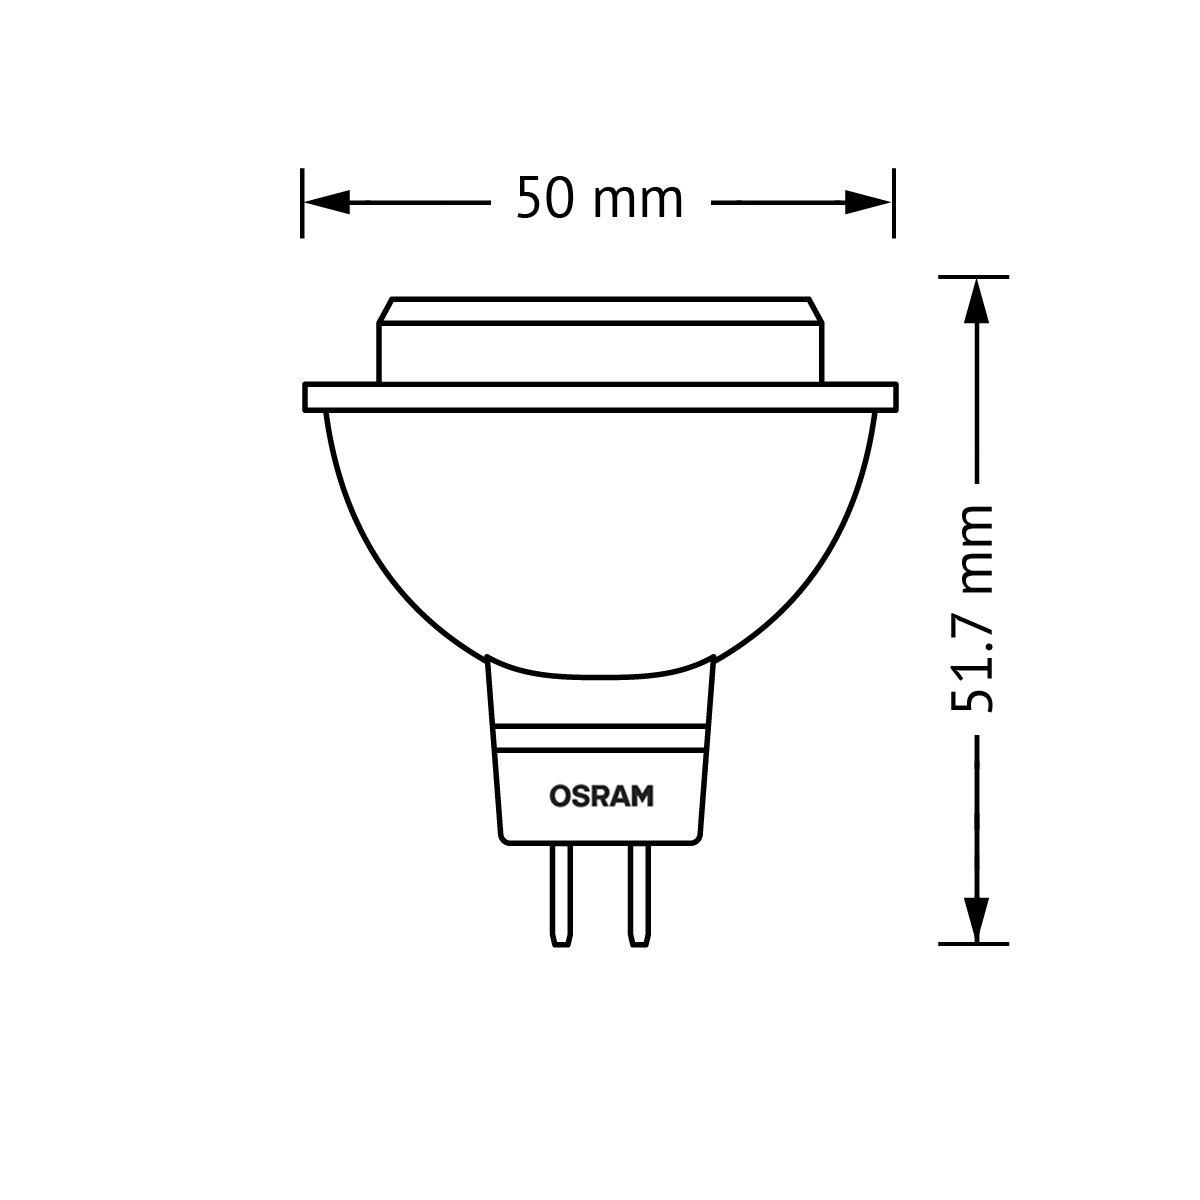 LED-Spot Abstrahlungswinkel 36/° // warmwei/ß 6er Pack 2700K 20 Watt-Ersatz OSRAM LED-Reflektorlampe GU5.3 Star MR16 12V // 3W